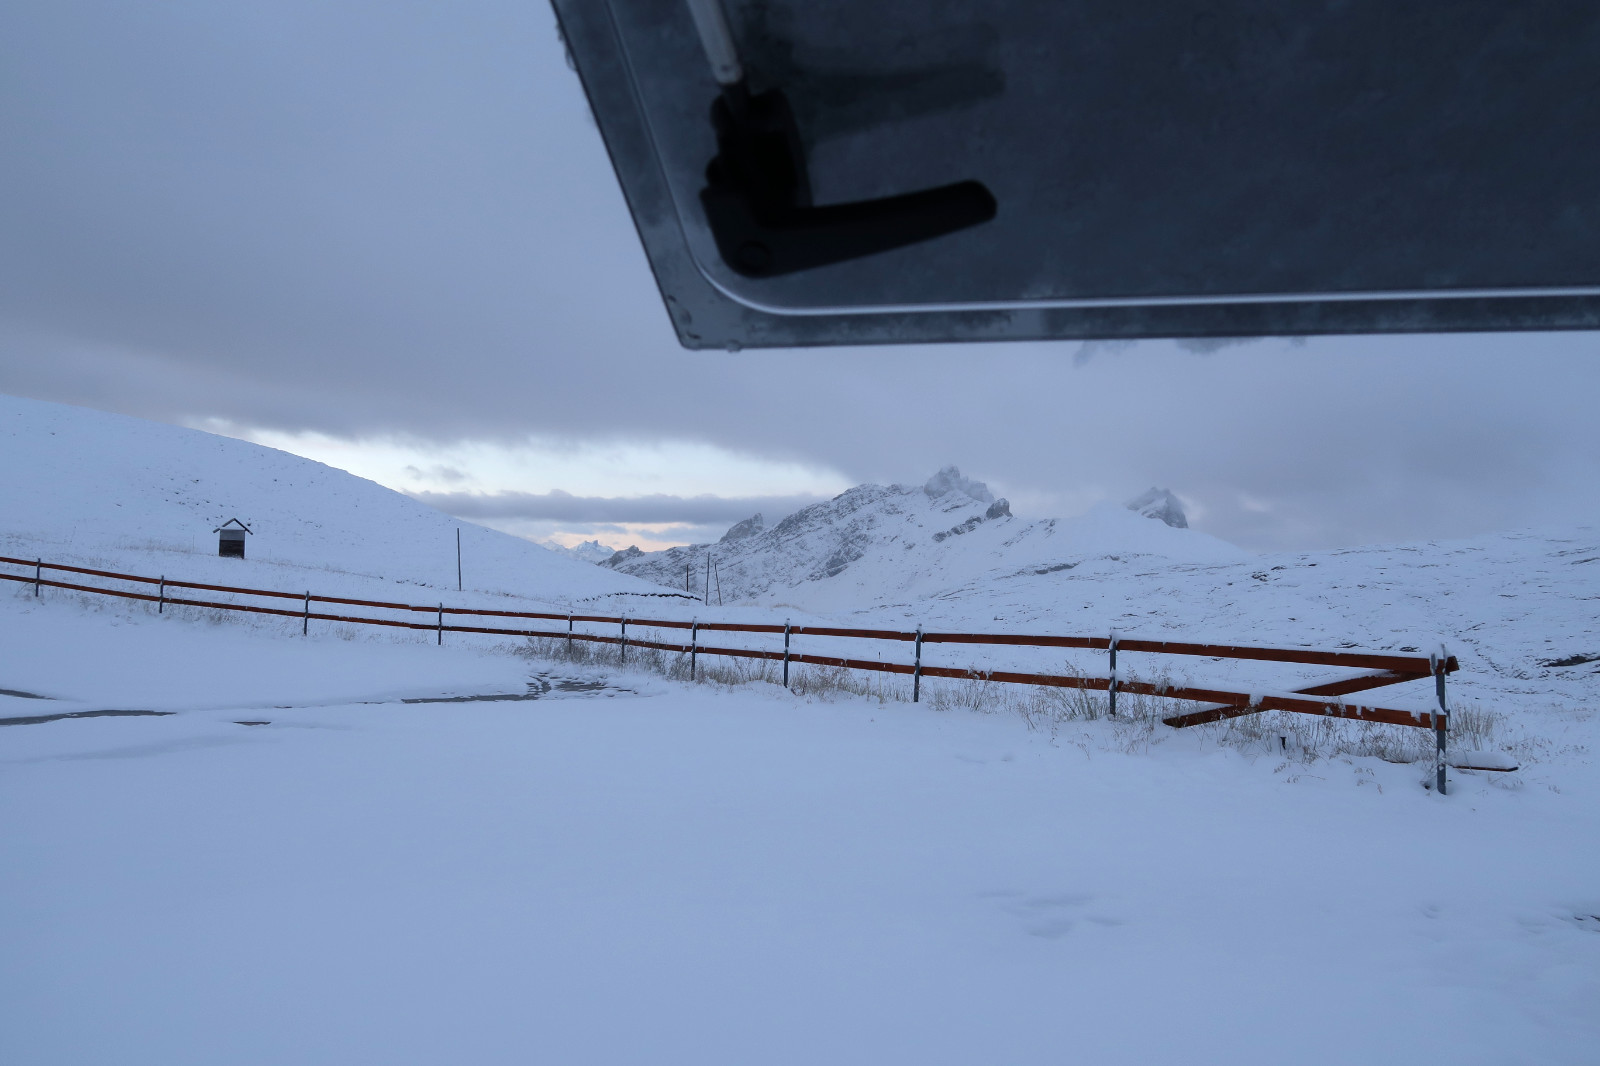 Der Blick aus dem Fenster am Morgen.